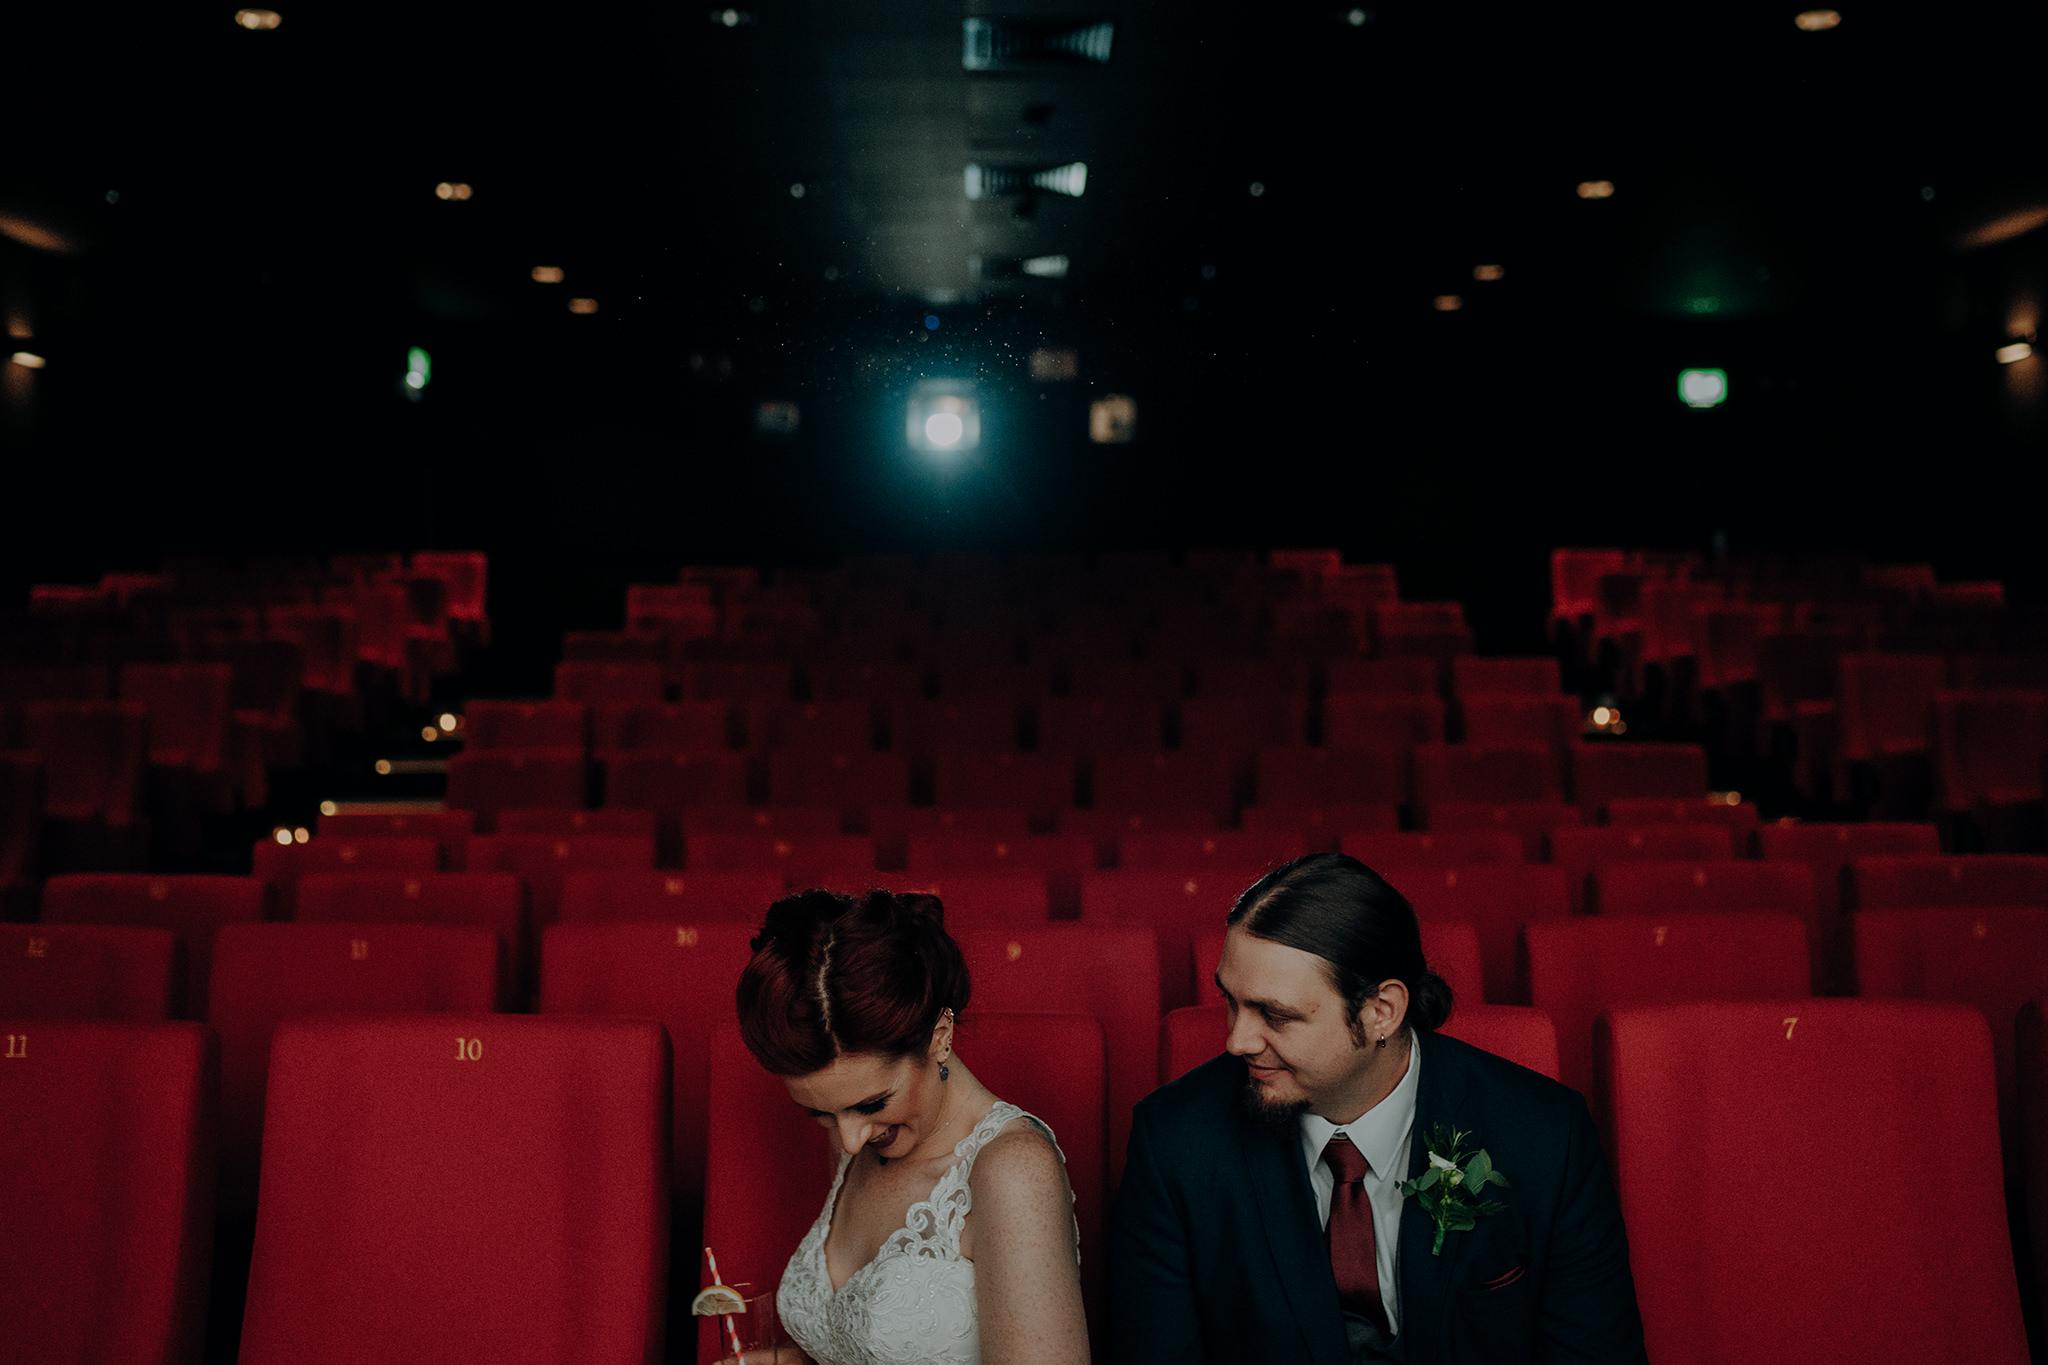 alternative wedding ceremony aft belfast rock n roll couple